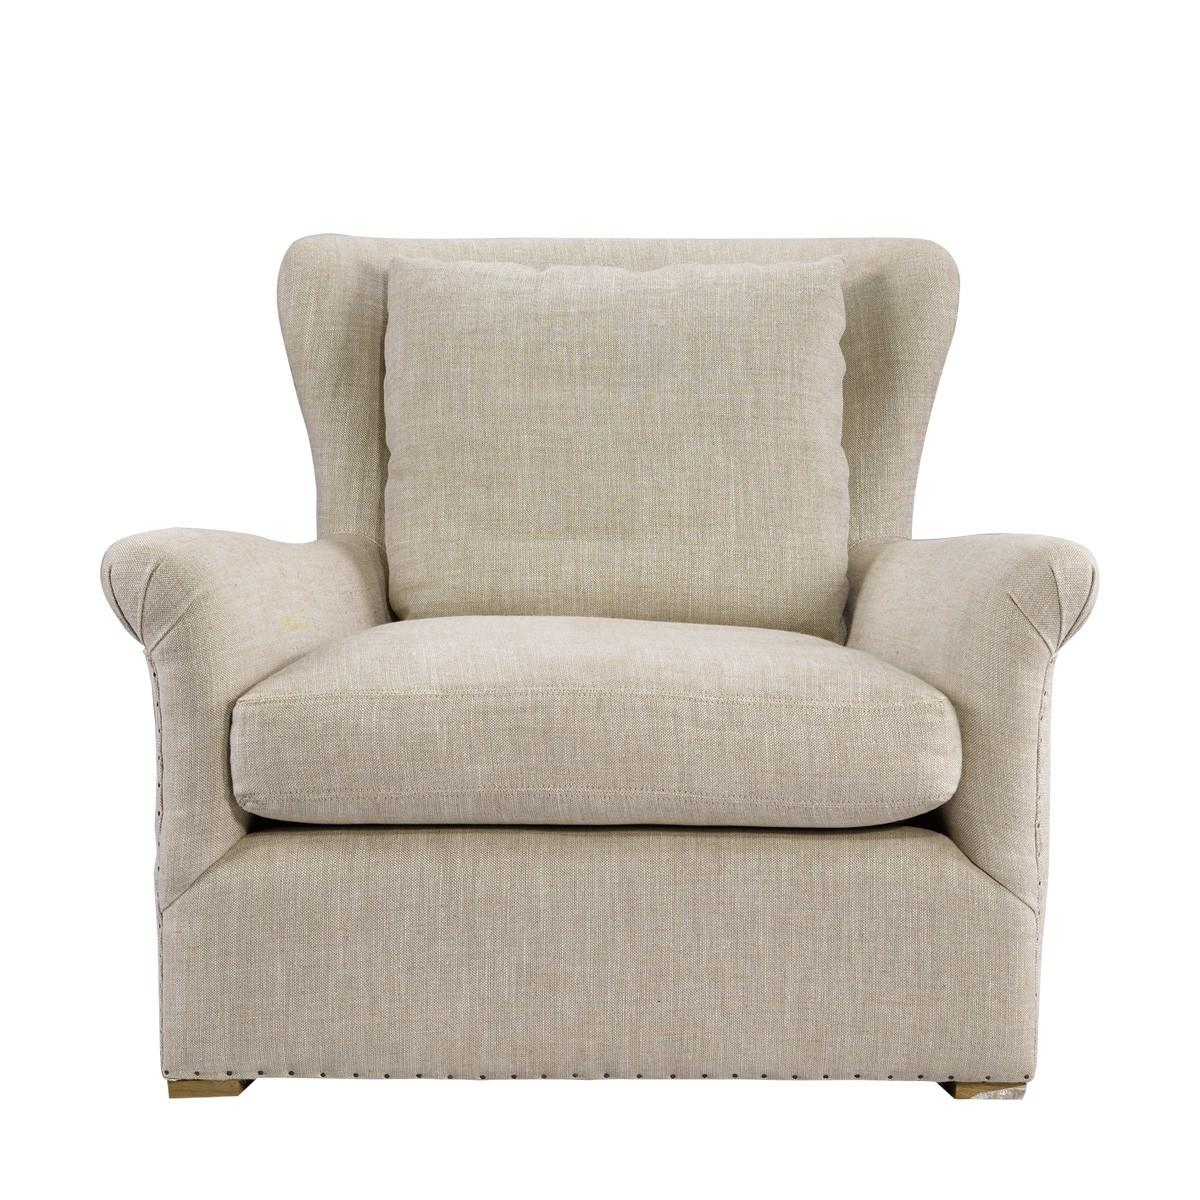 Winslow Lounge Chair Beige Linen 7841.1003-1-A015 Beige - на 360.ru: цены, описание, характеристики, где купить в Москве.